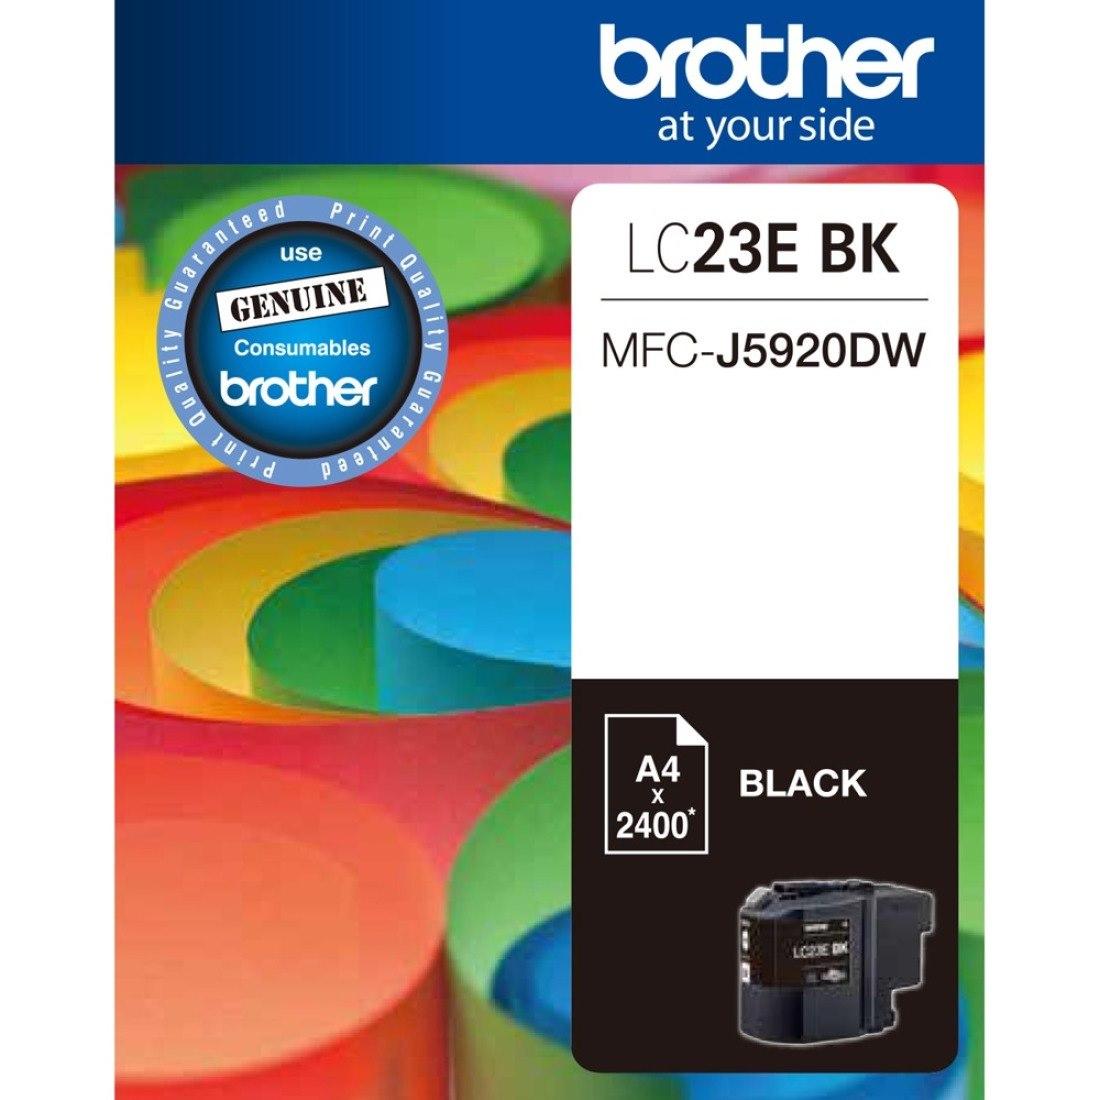 Brother LC23EBK Ink Cartridge - Black